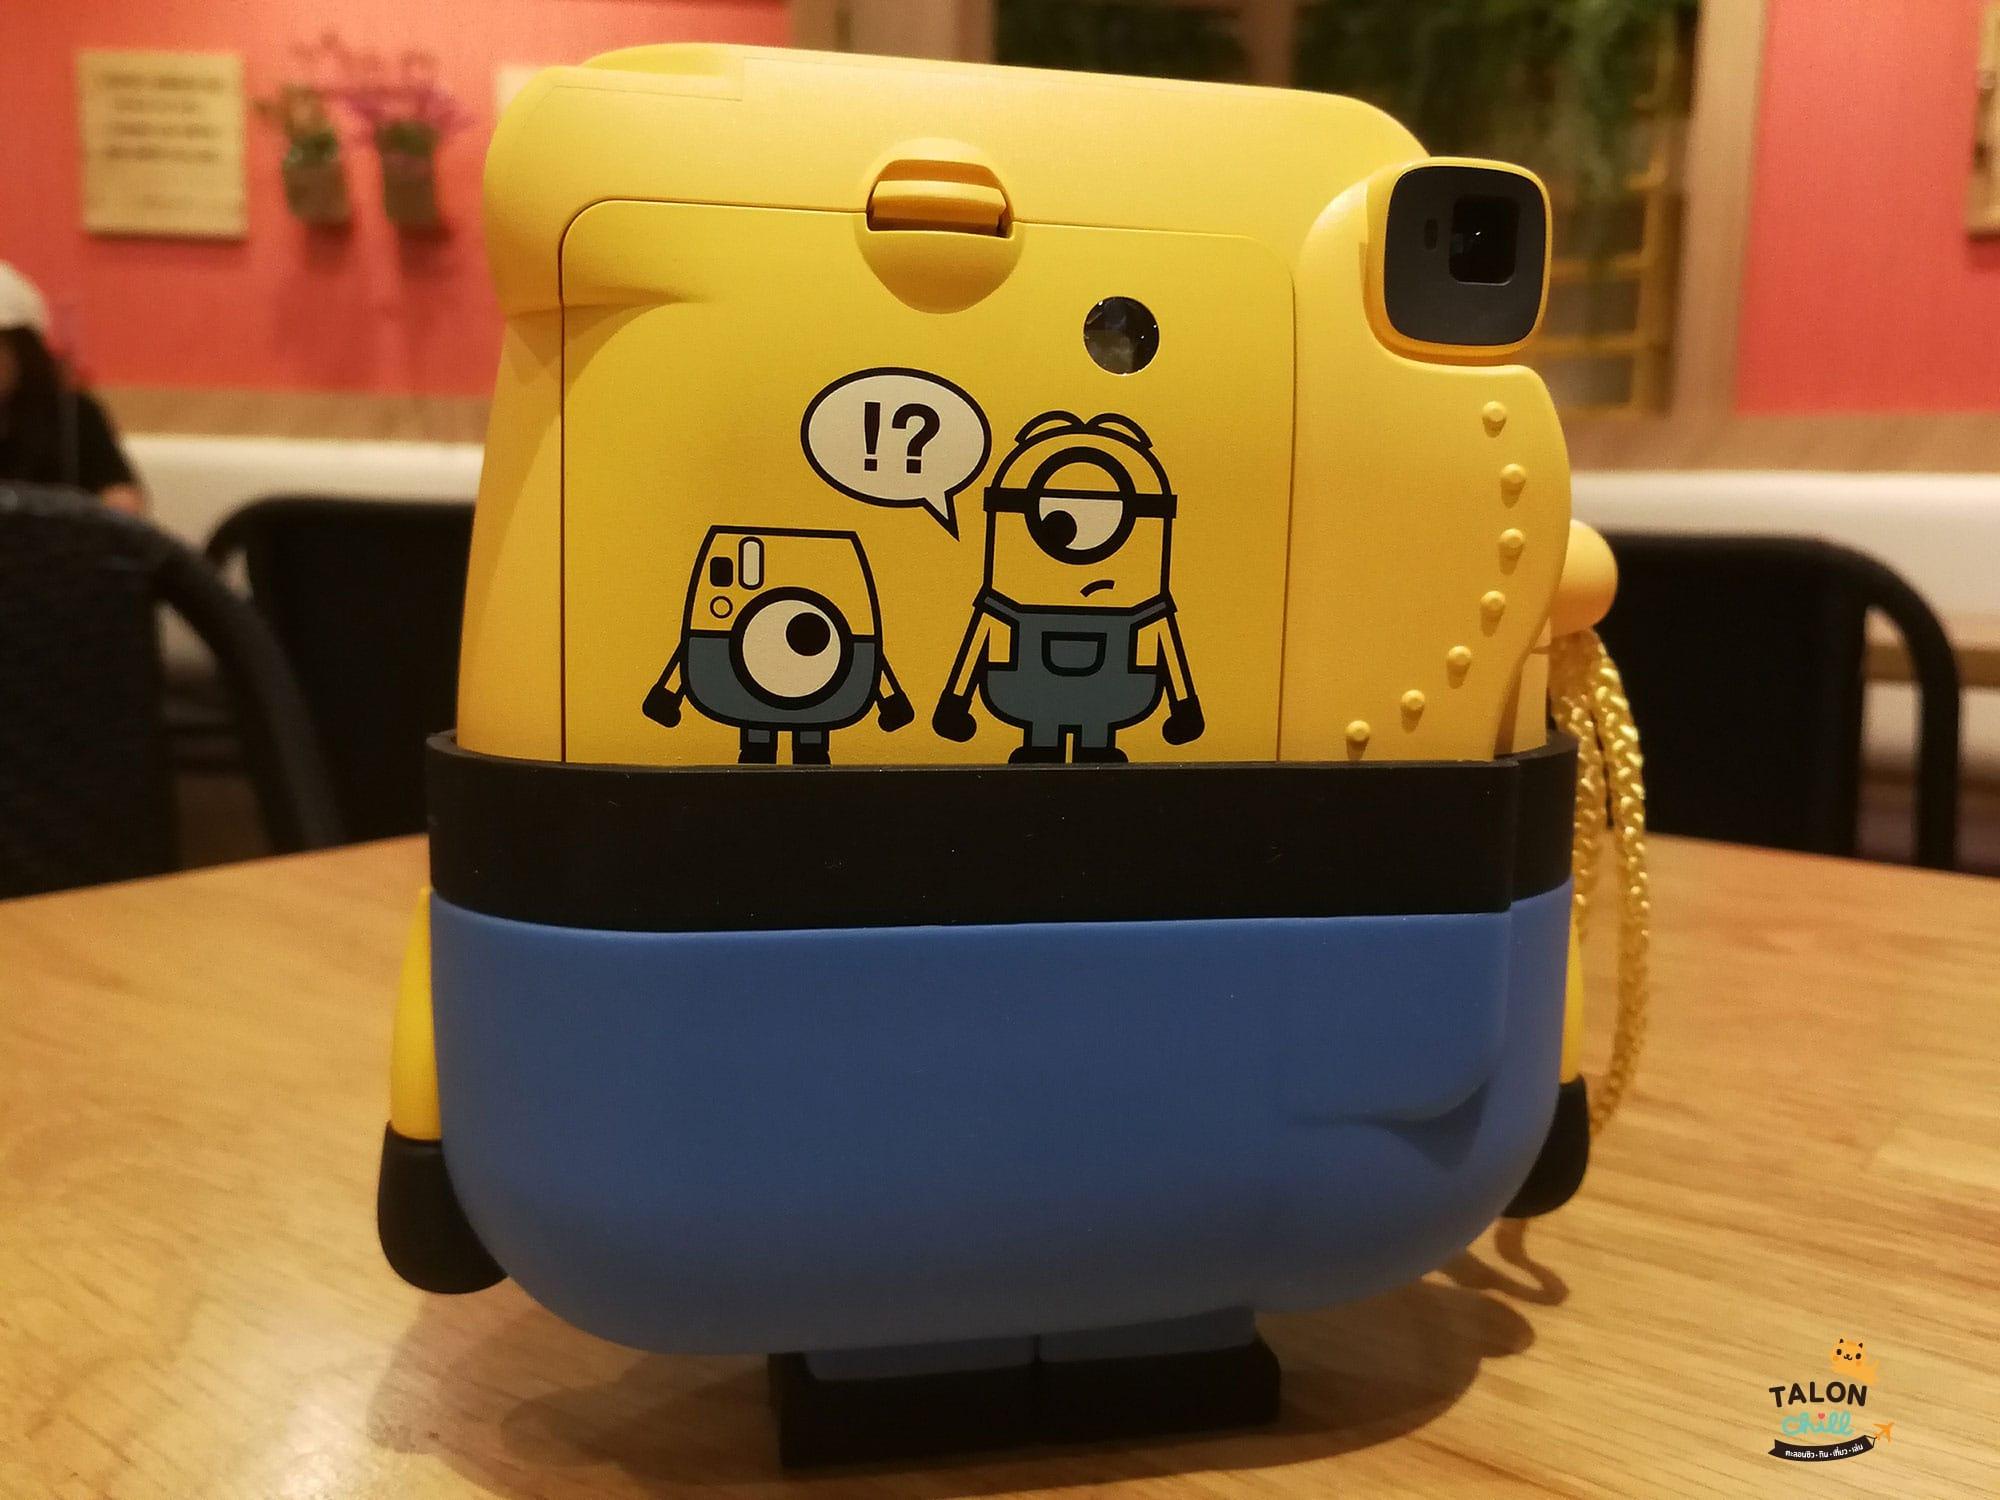 [Review] กล้องโพลารอยด์ลายมินเนี่ยน (Minion Instax mini 8 Instant Film Camera)